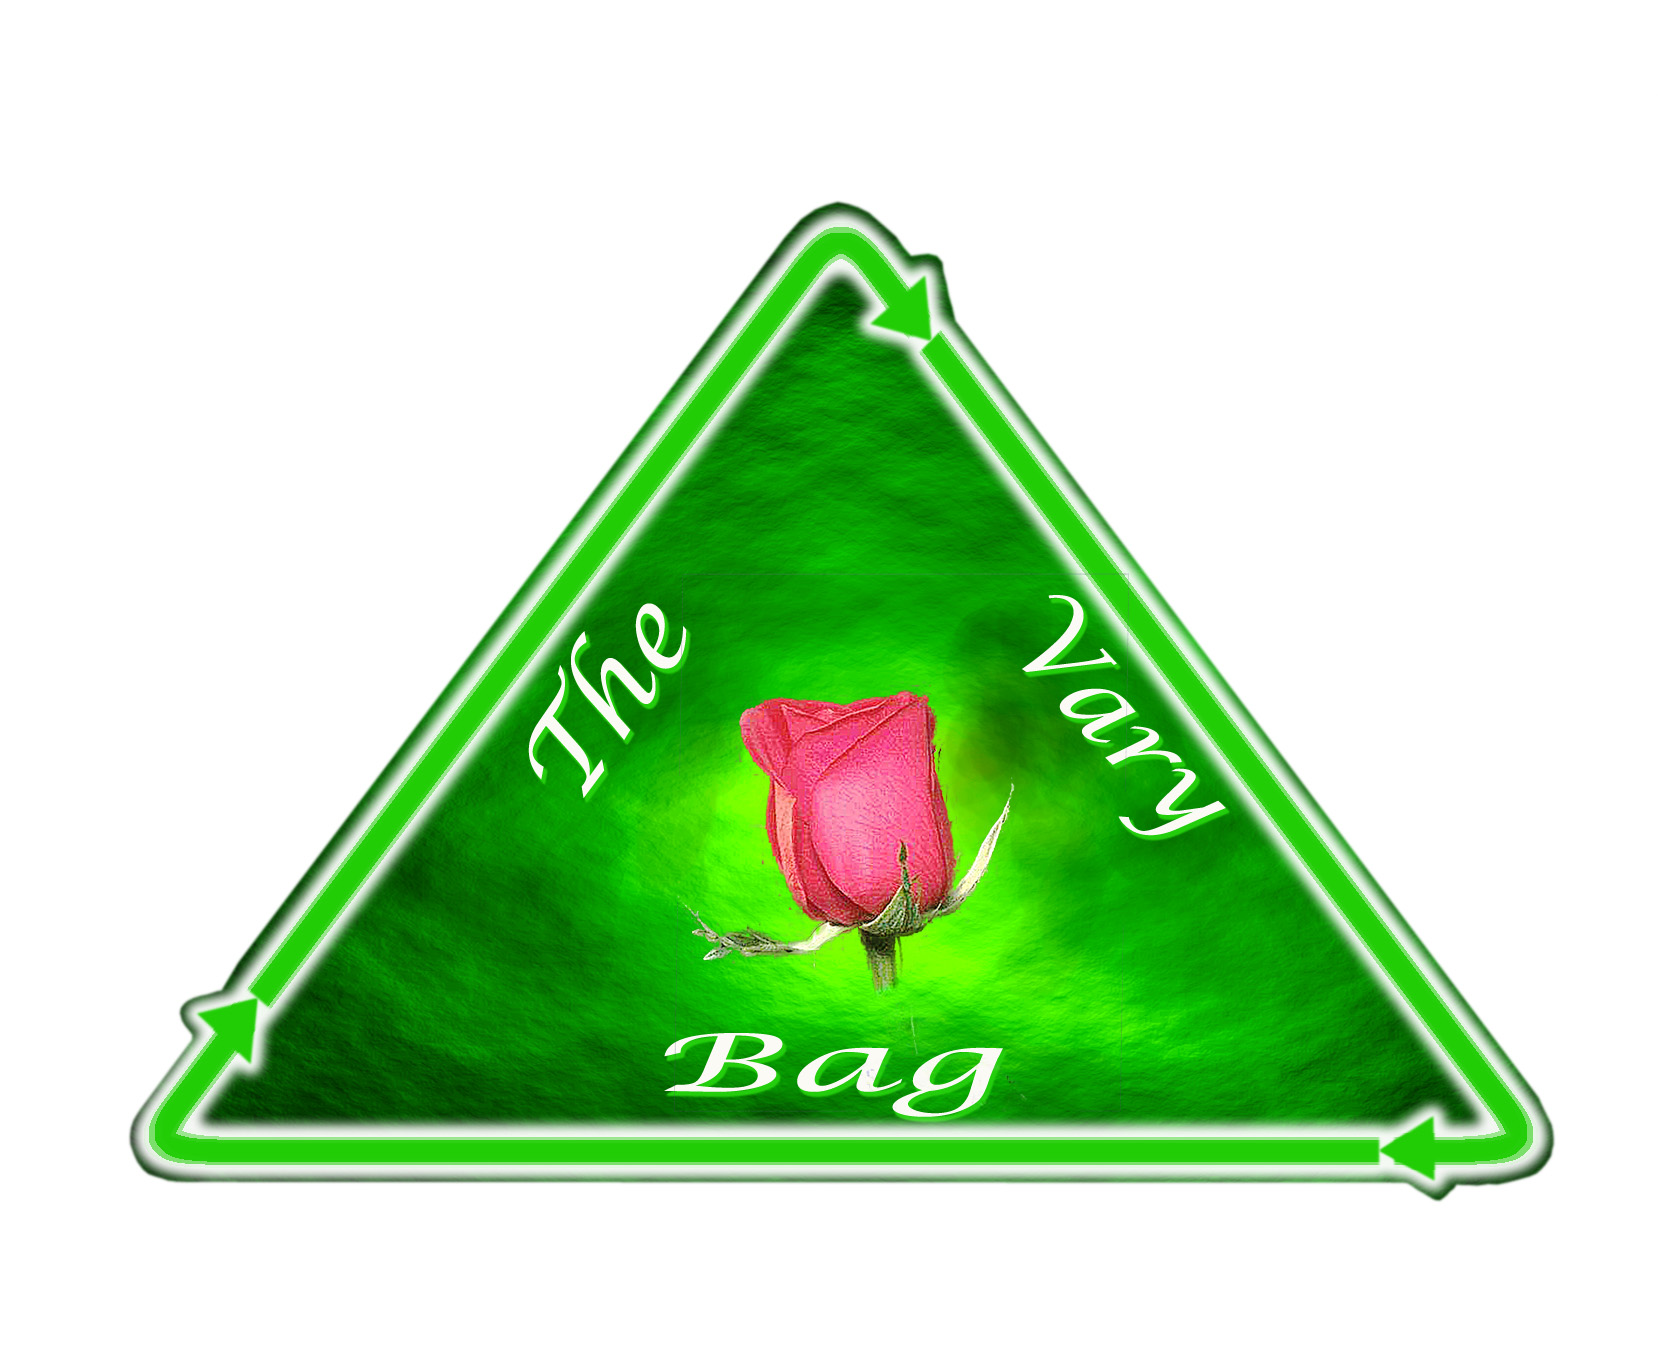 The Vary Bag